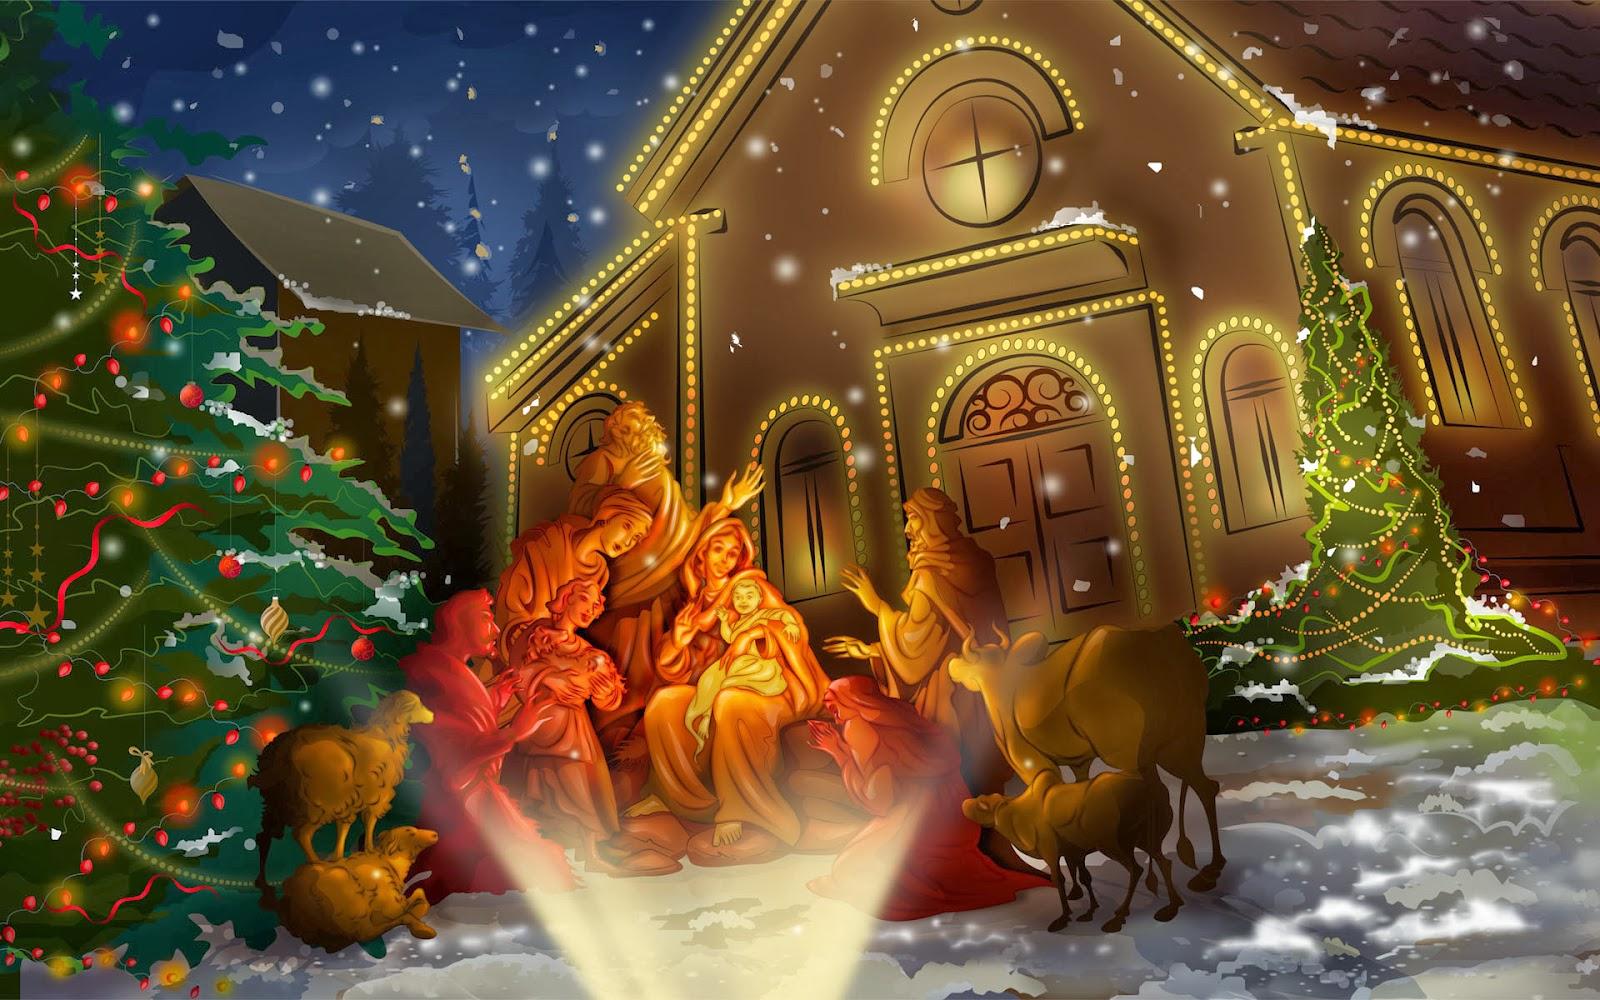 festivals celebration: celebrating the birth of Jesus Christ - Christmas